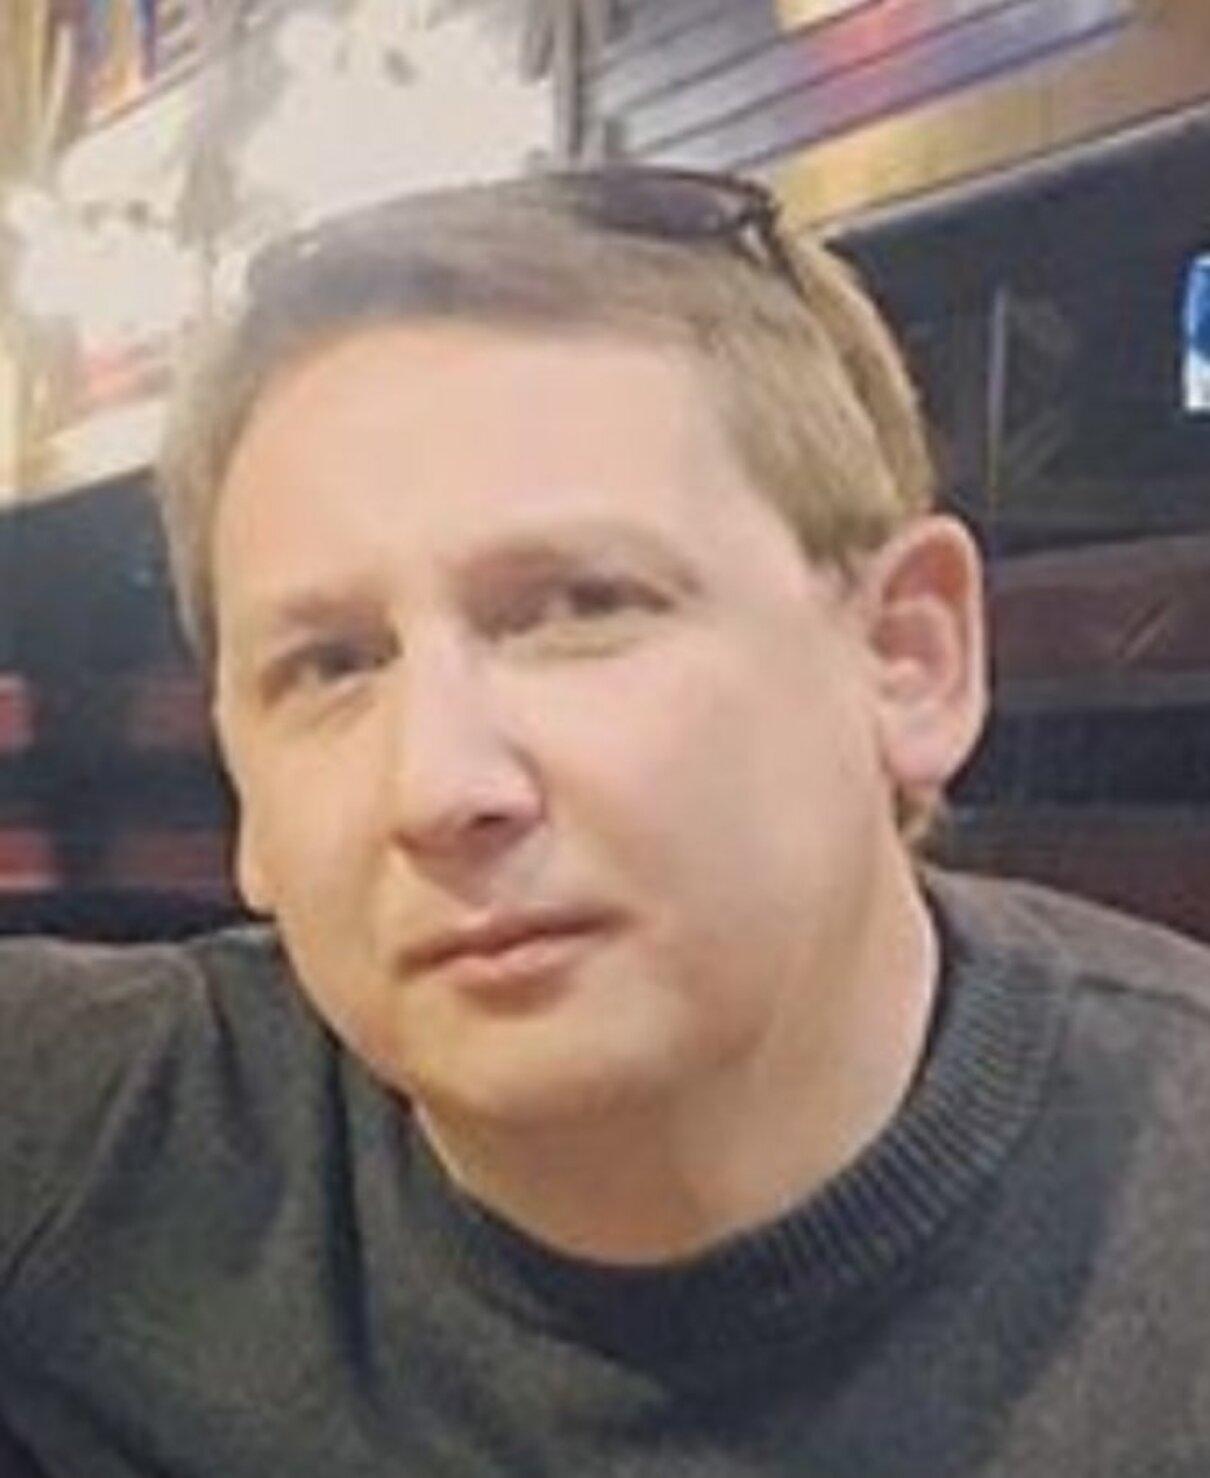 Жалоба-отзыв: Антон Олегович Сунагатуллин - Мошенник из Сочи.  Фото №4